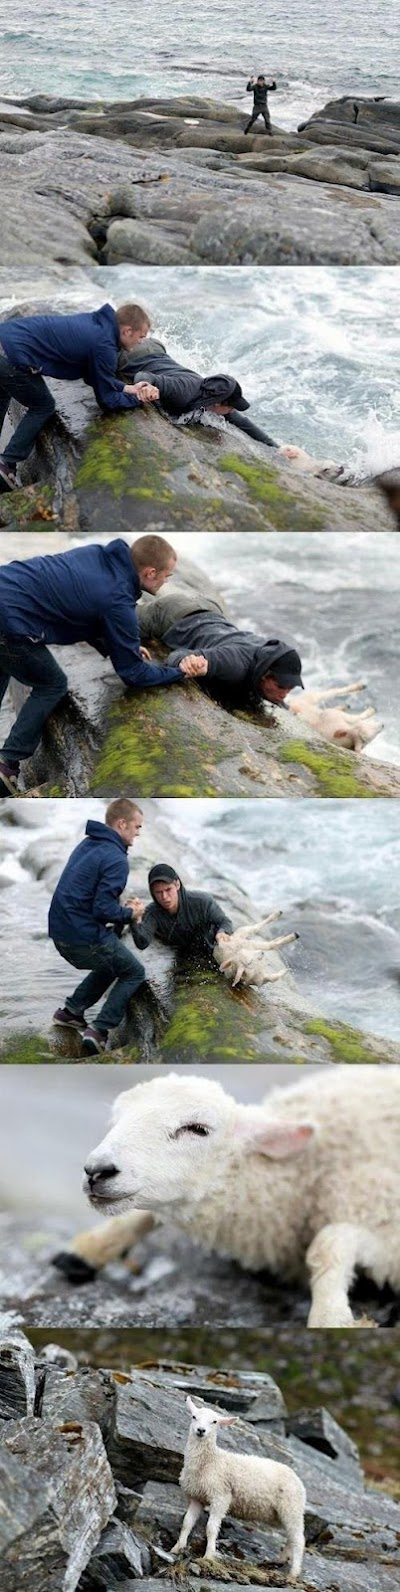 Penyelamatan domba!